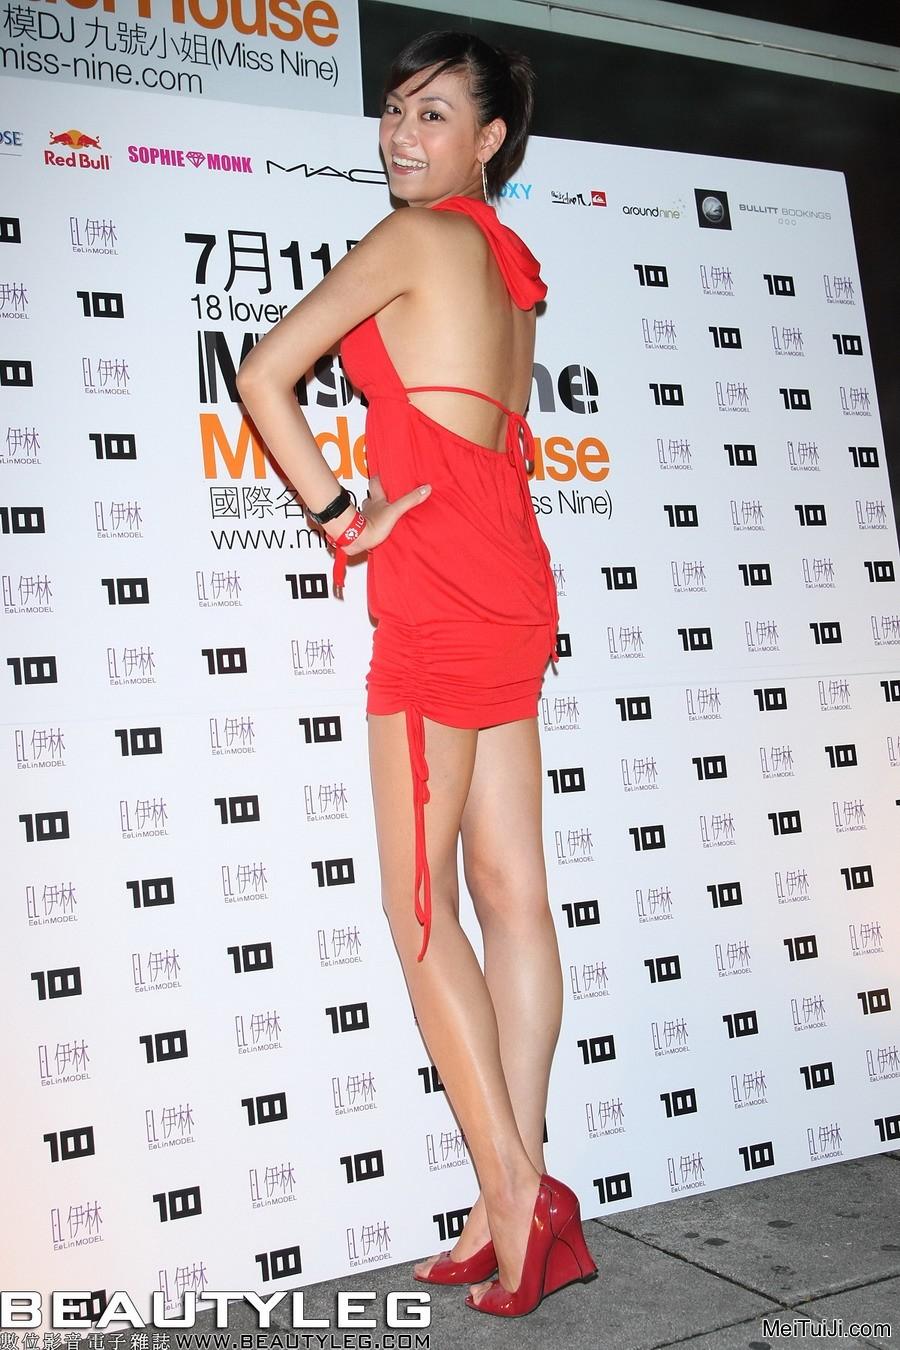 Beauty Update Kylie Jenner Lipkit Dupes: 20080715 BEAUTY NEWS UPDATE 03_丝袜美腿-美腿集-Beautyleg